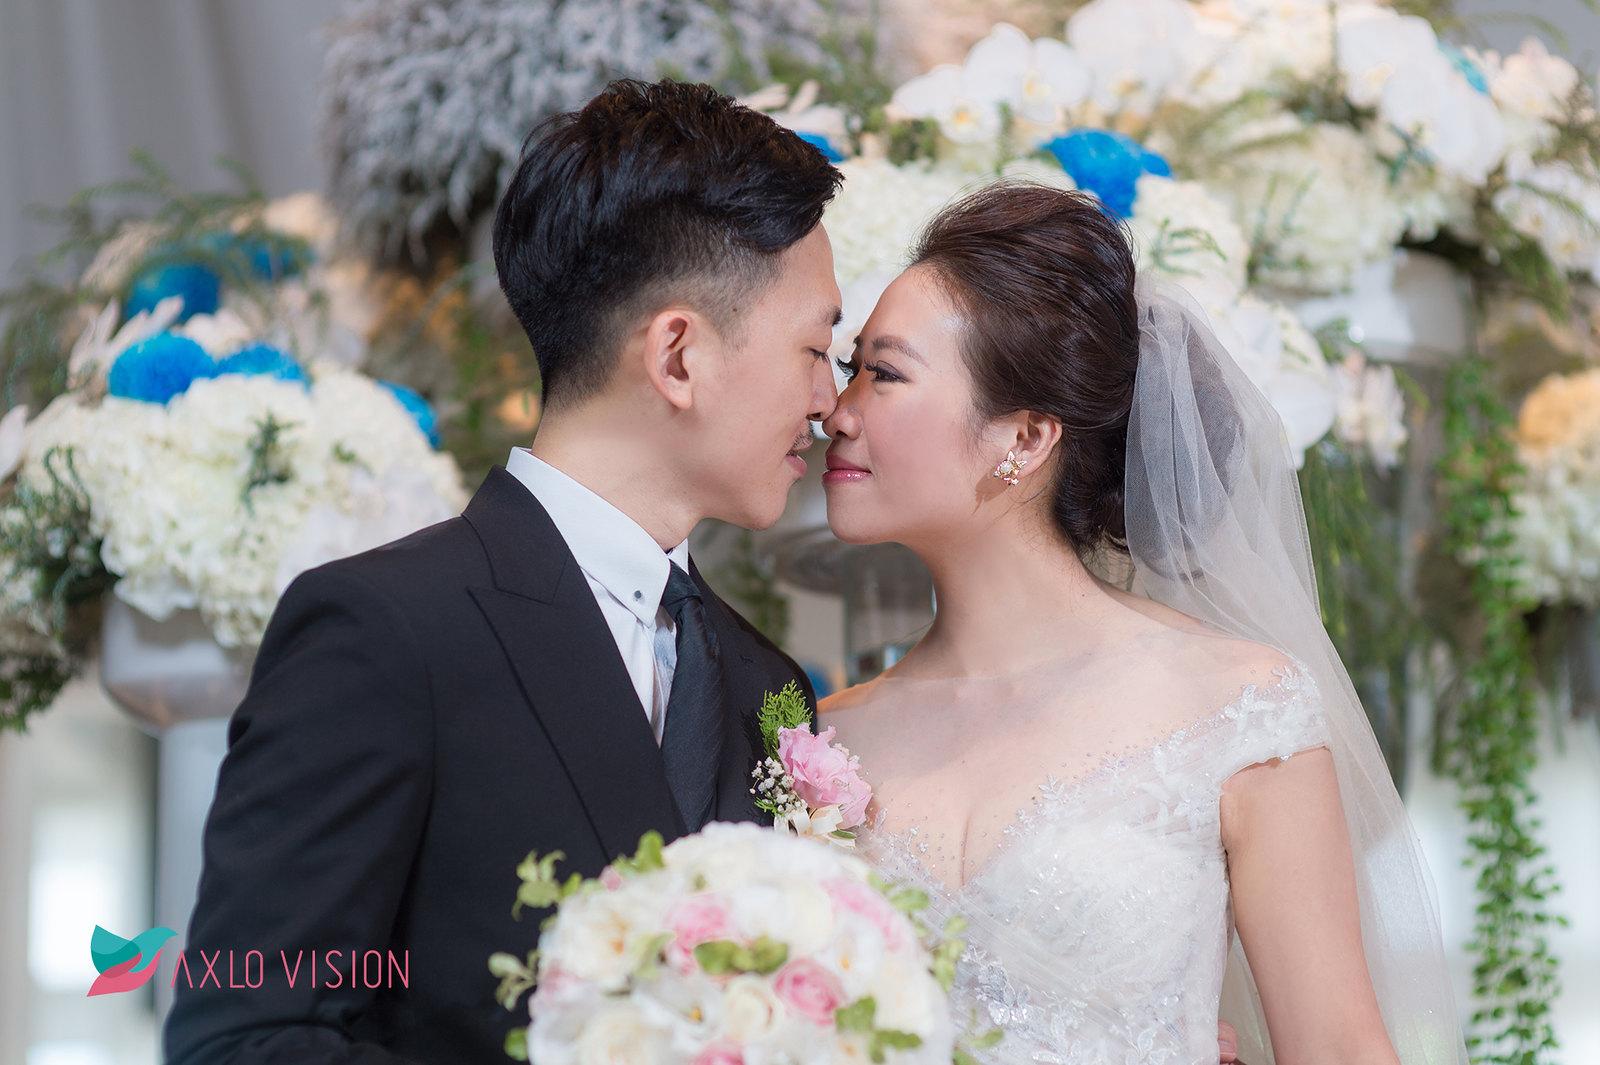 20170916 WeddingDay_082